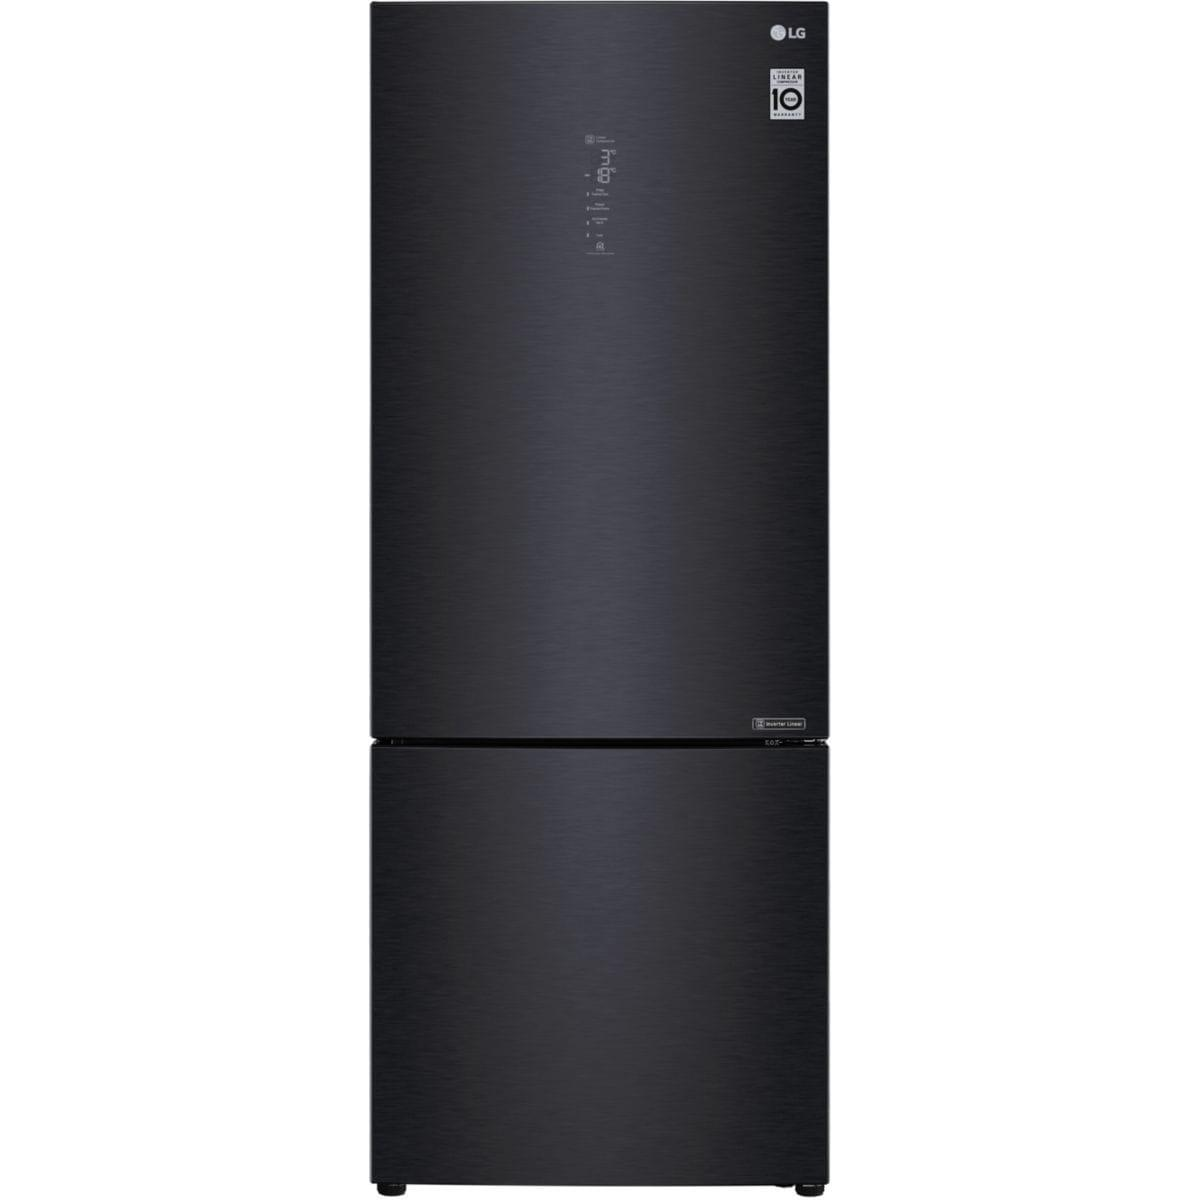 Photo Réfrigérateur Combiné LG GBB569MCAZN